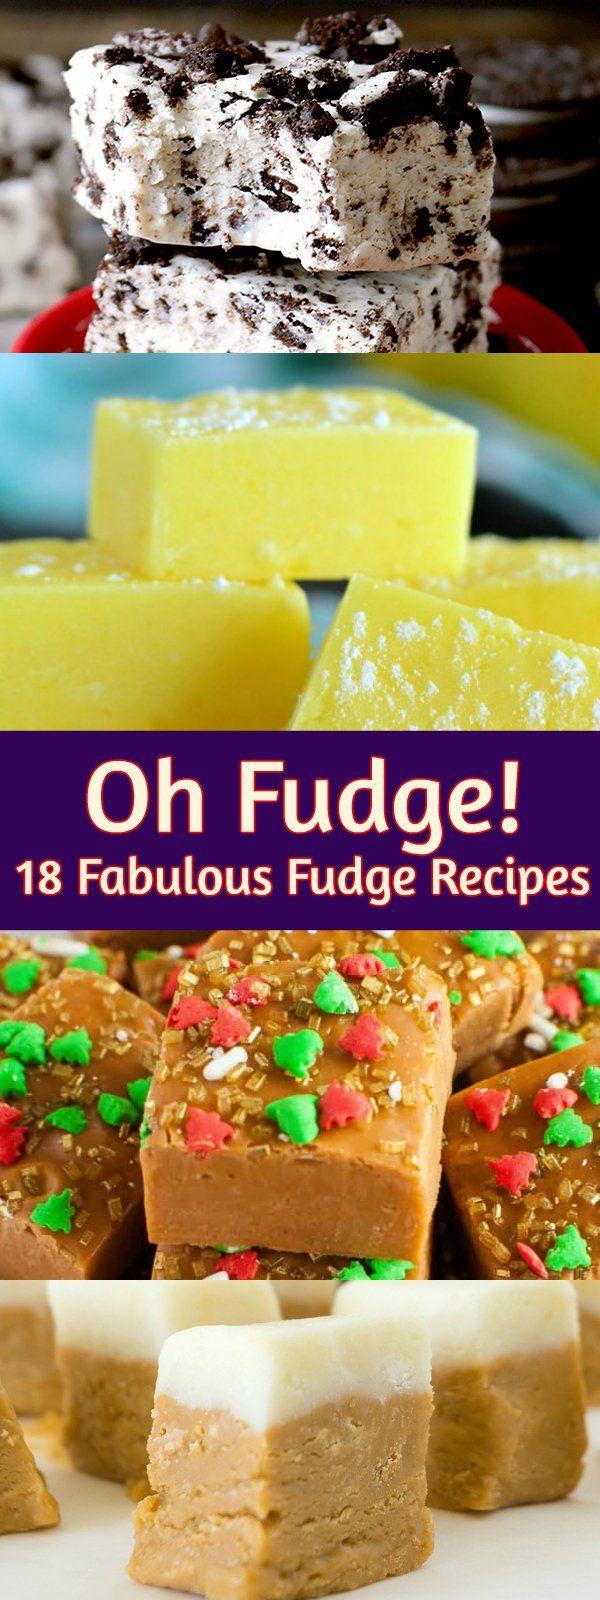 Oh Fudge! 18 Fabulous Fudge Recipes for Christmas